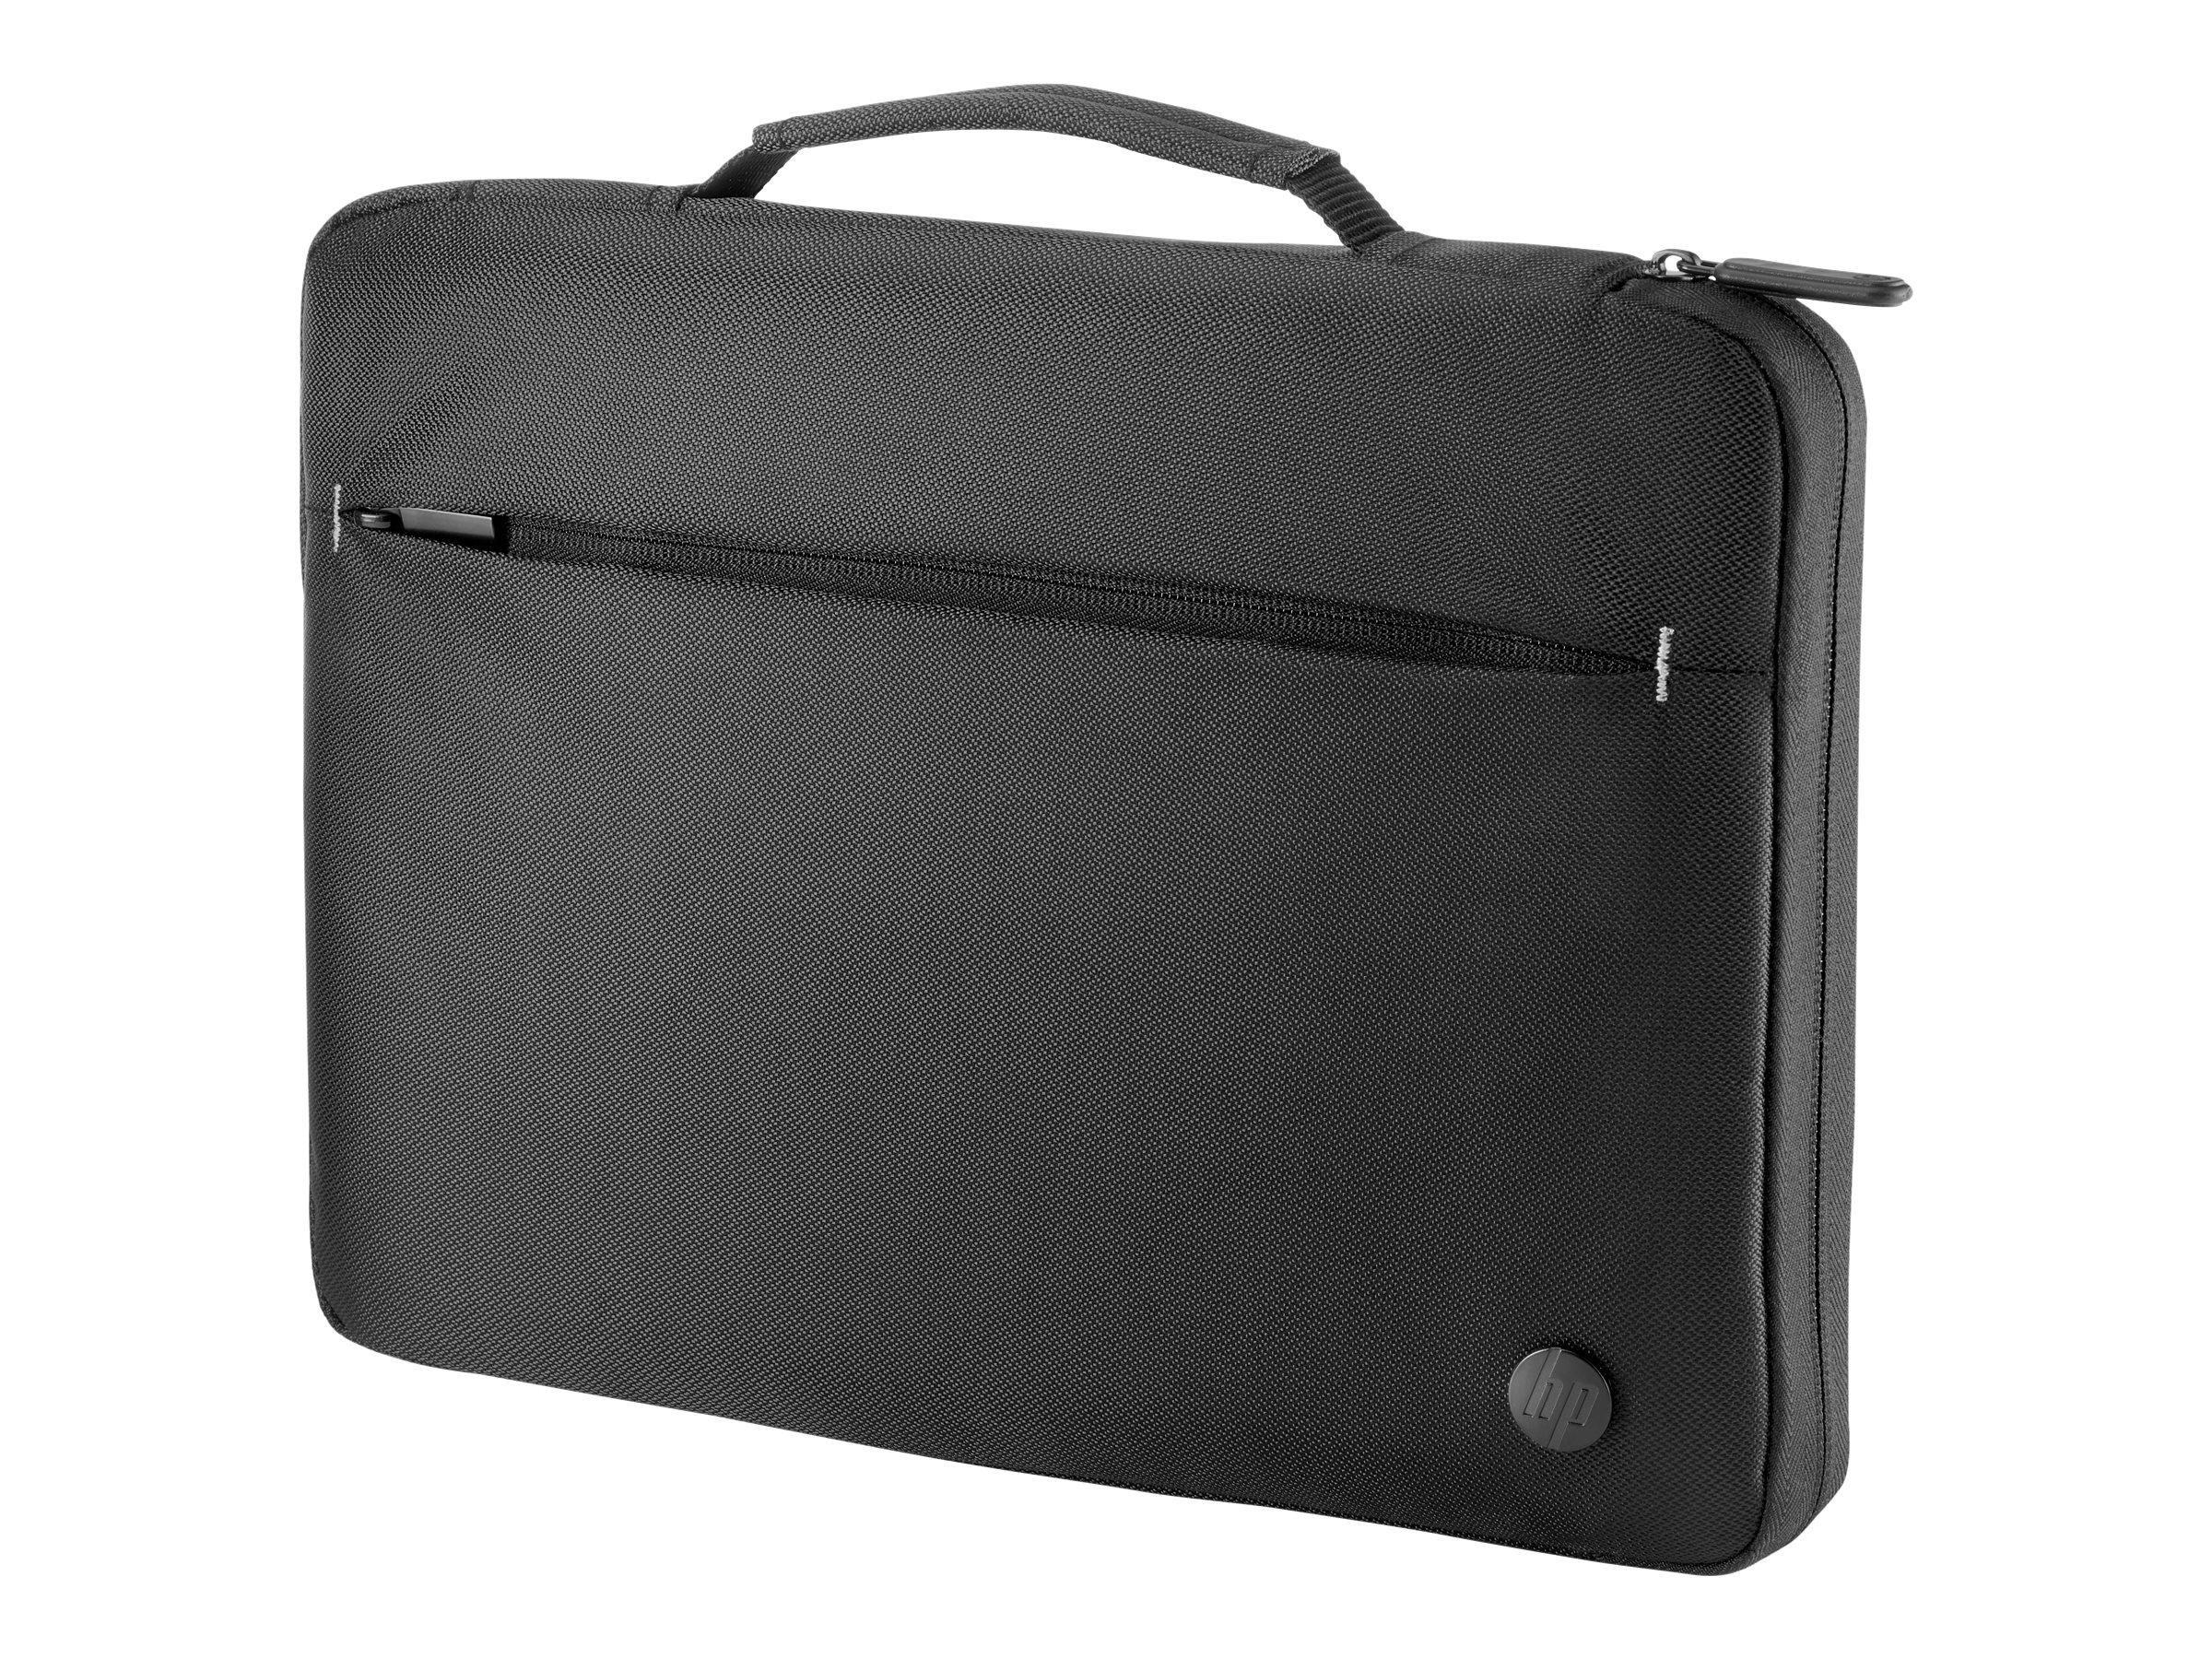 HP Business - Notebook-Hülle - 33.8 cm (13.3